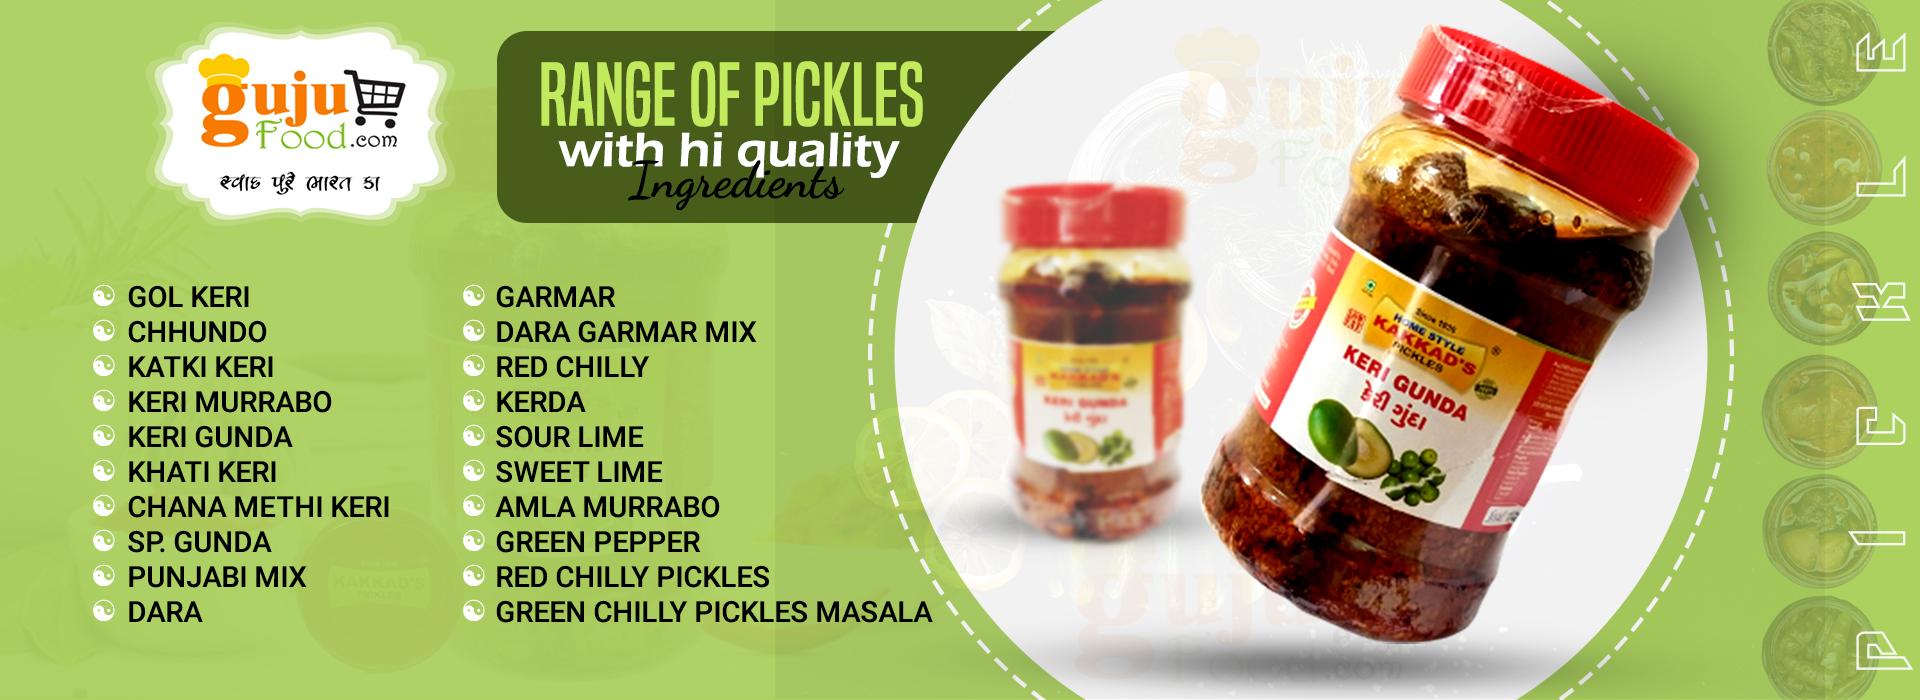 Kakkad Brother's Pickles